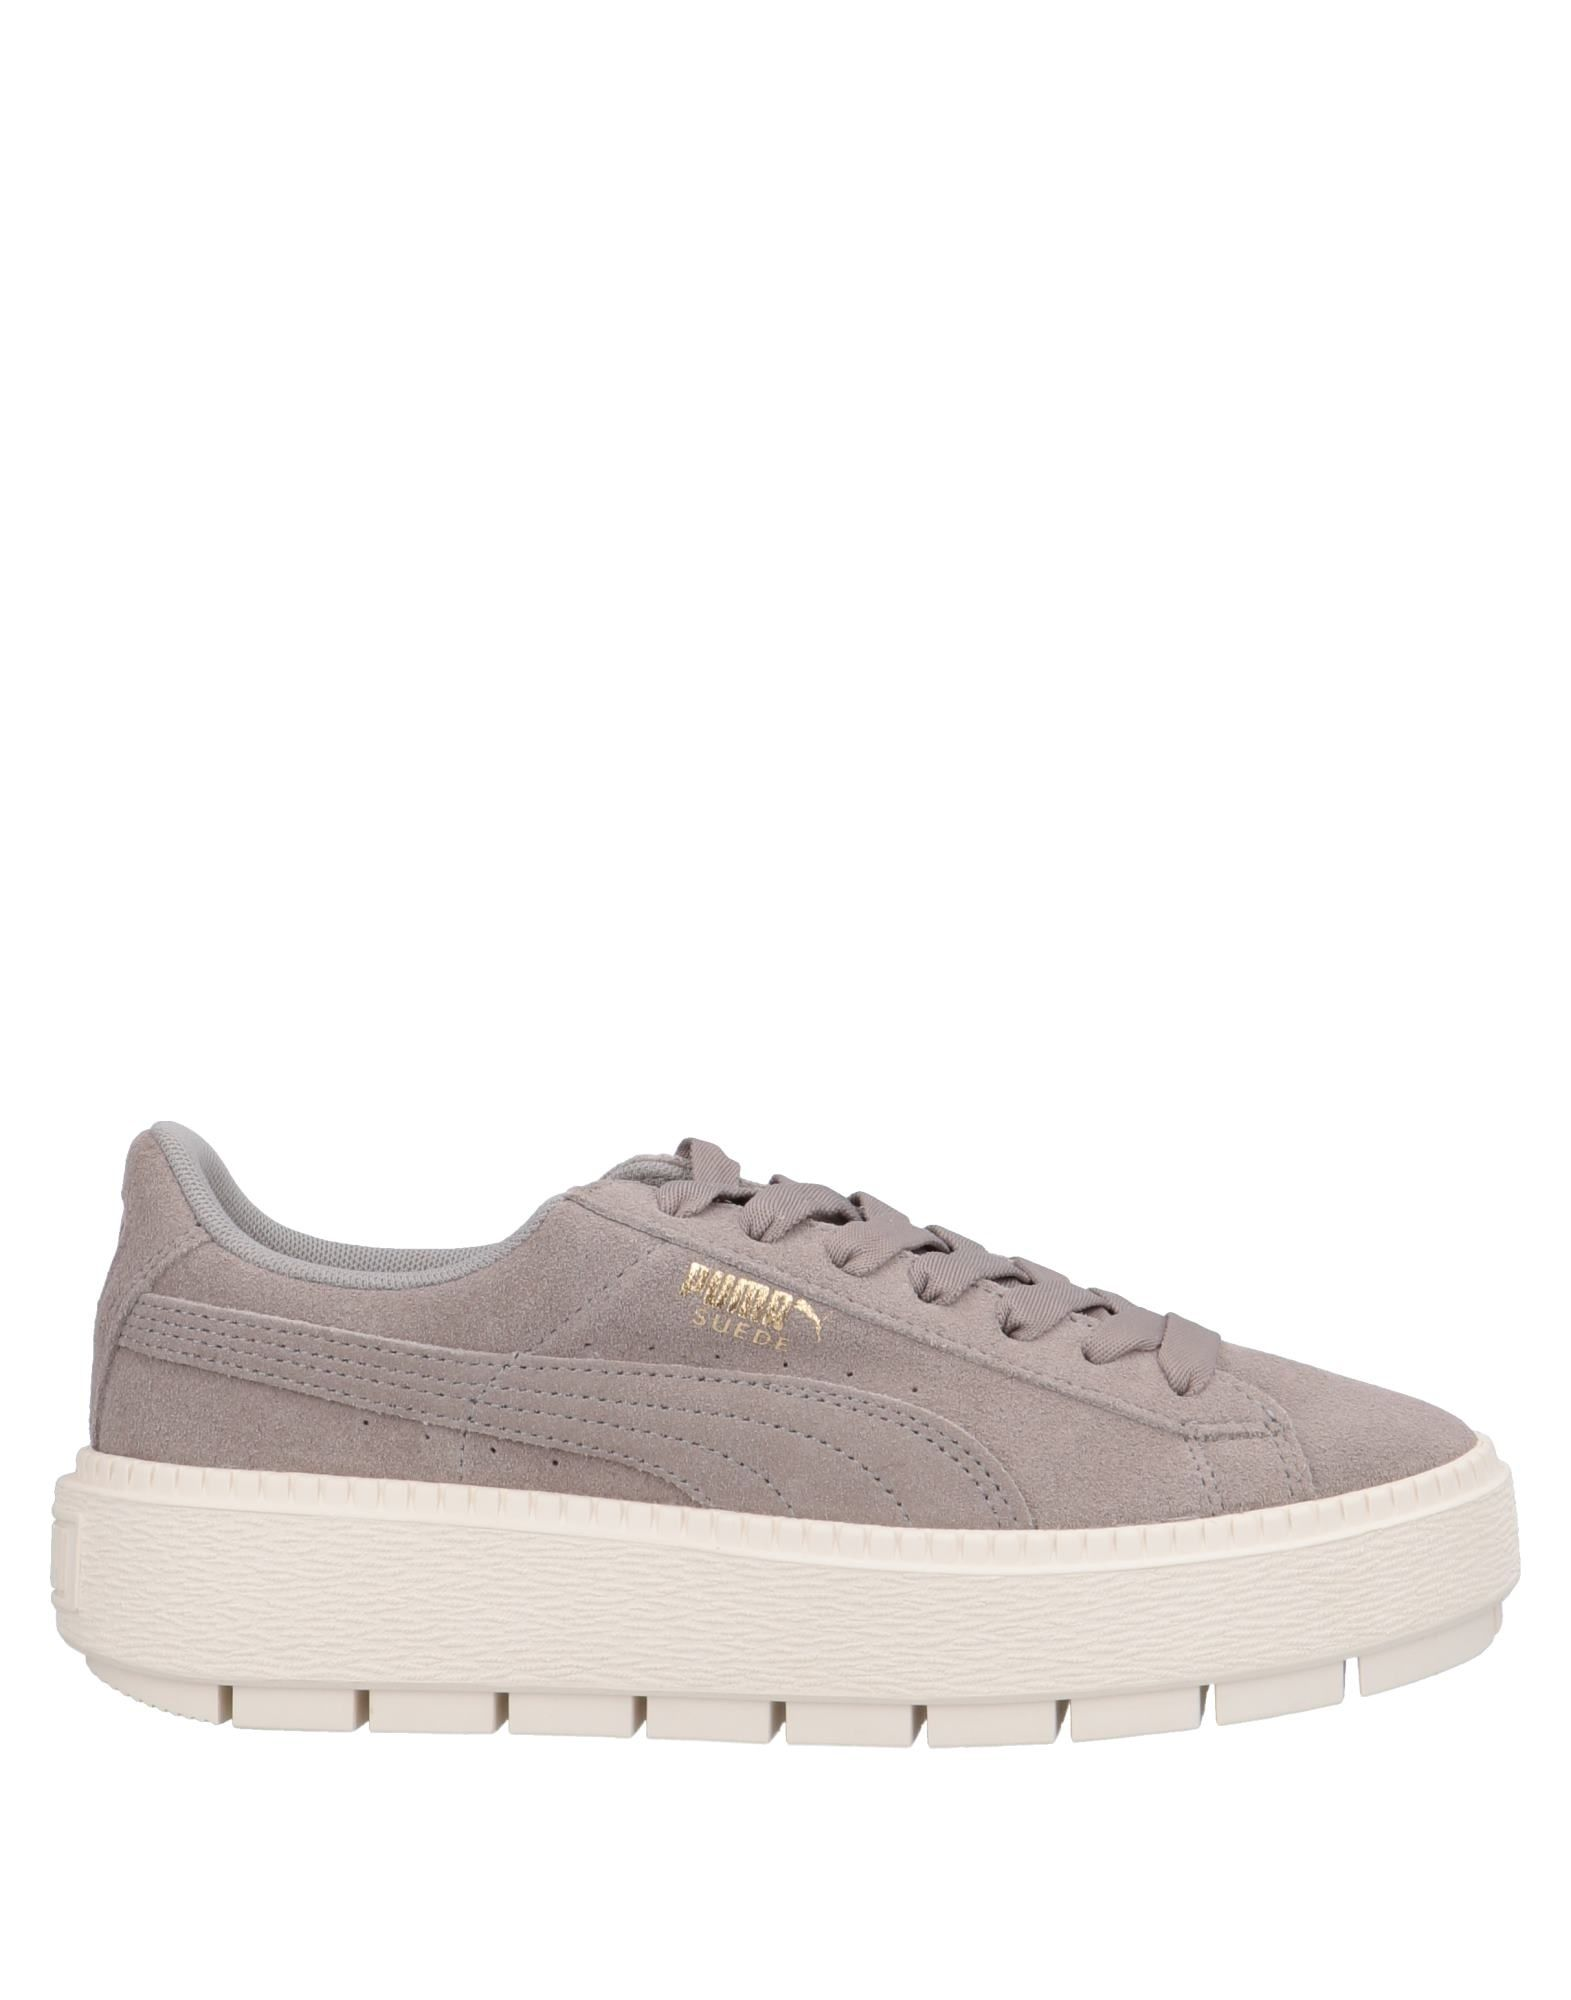 Puma Sneakers online - Women Puma Sneakers online Sneakers on  Australia - 11559269WV 497fed